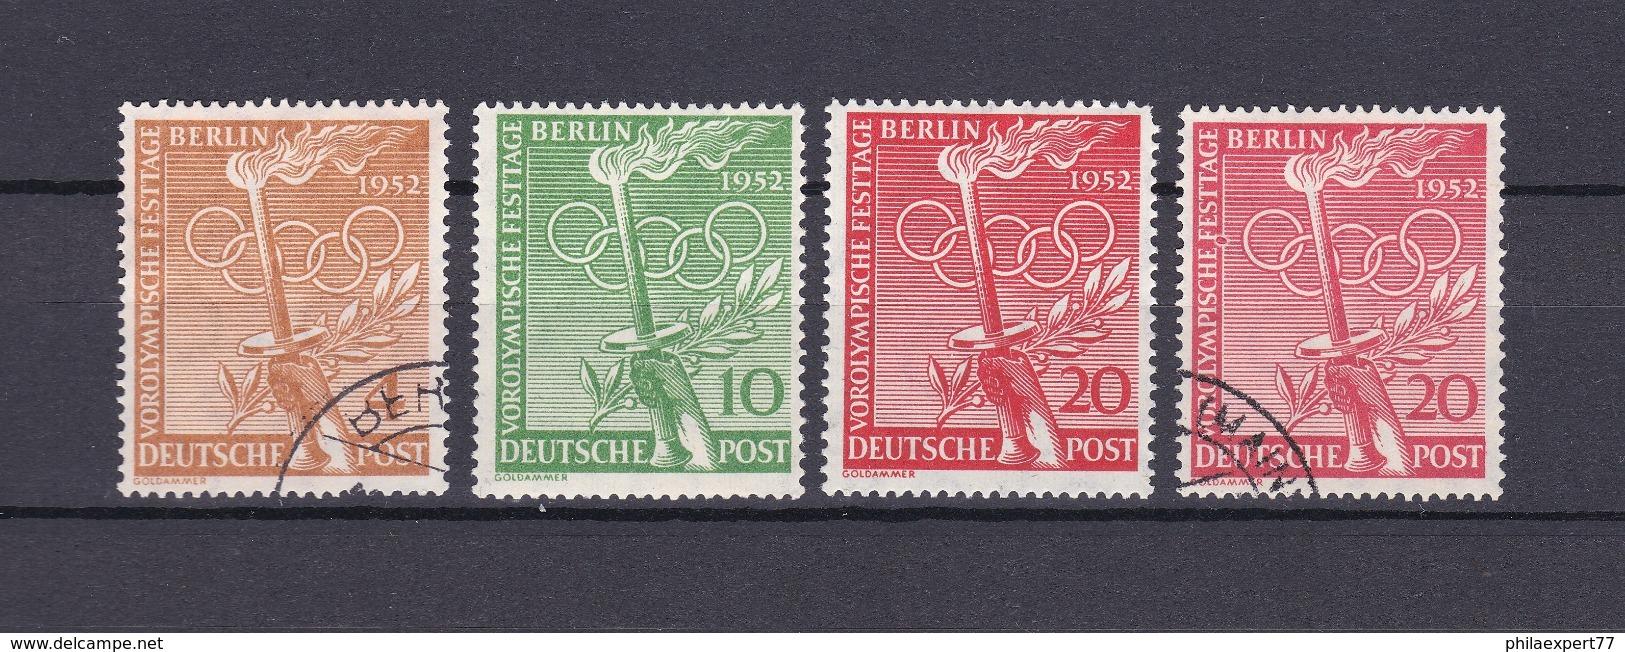 Berlin - 1952 - Michel Nr. 88/90 - Gest./Postfrisch - 58 Euro - Berlin (West)